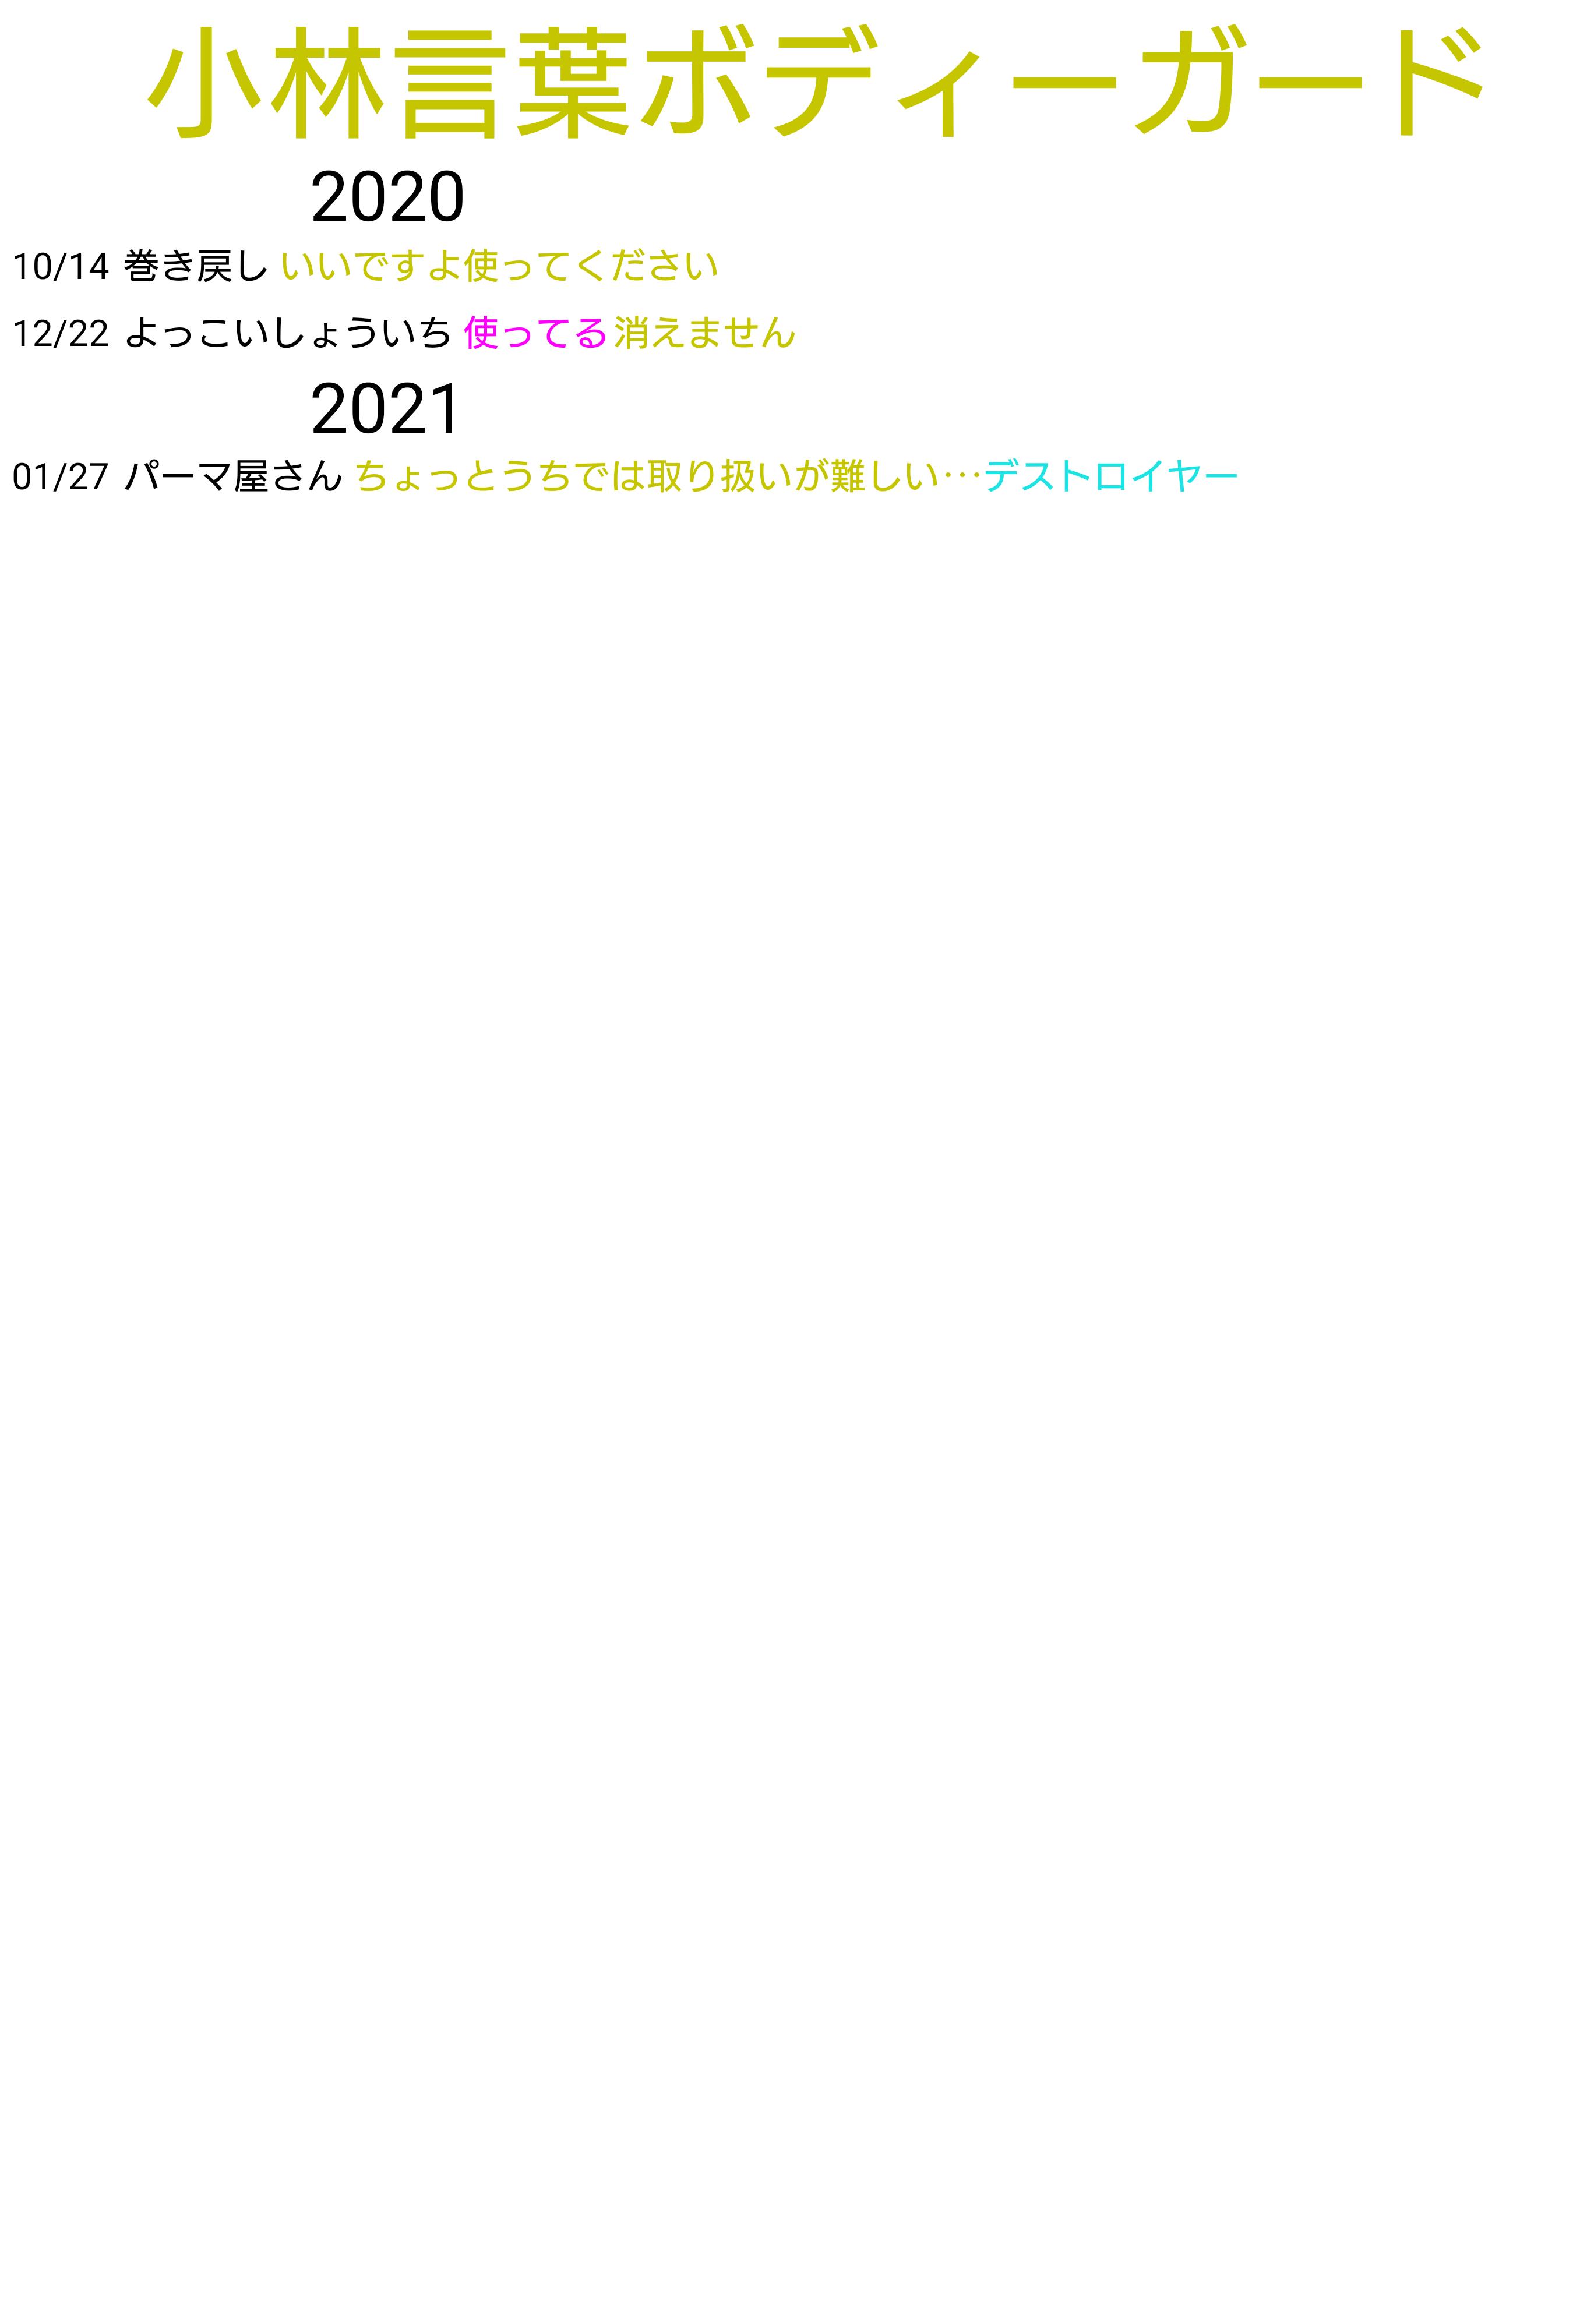 f:id:nanana8ebi:20210219175035p:plain